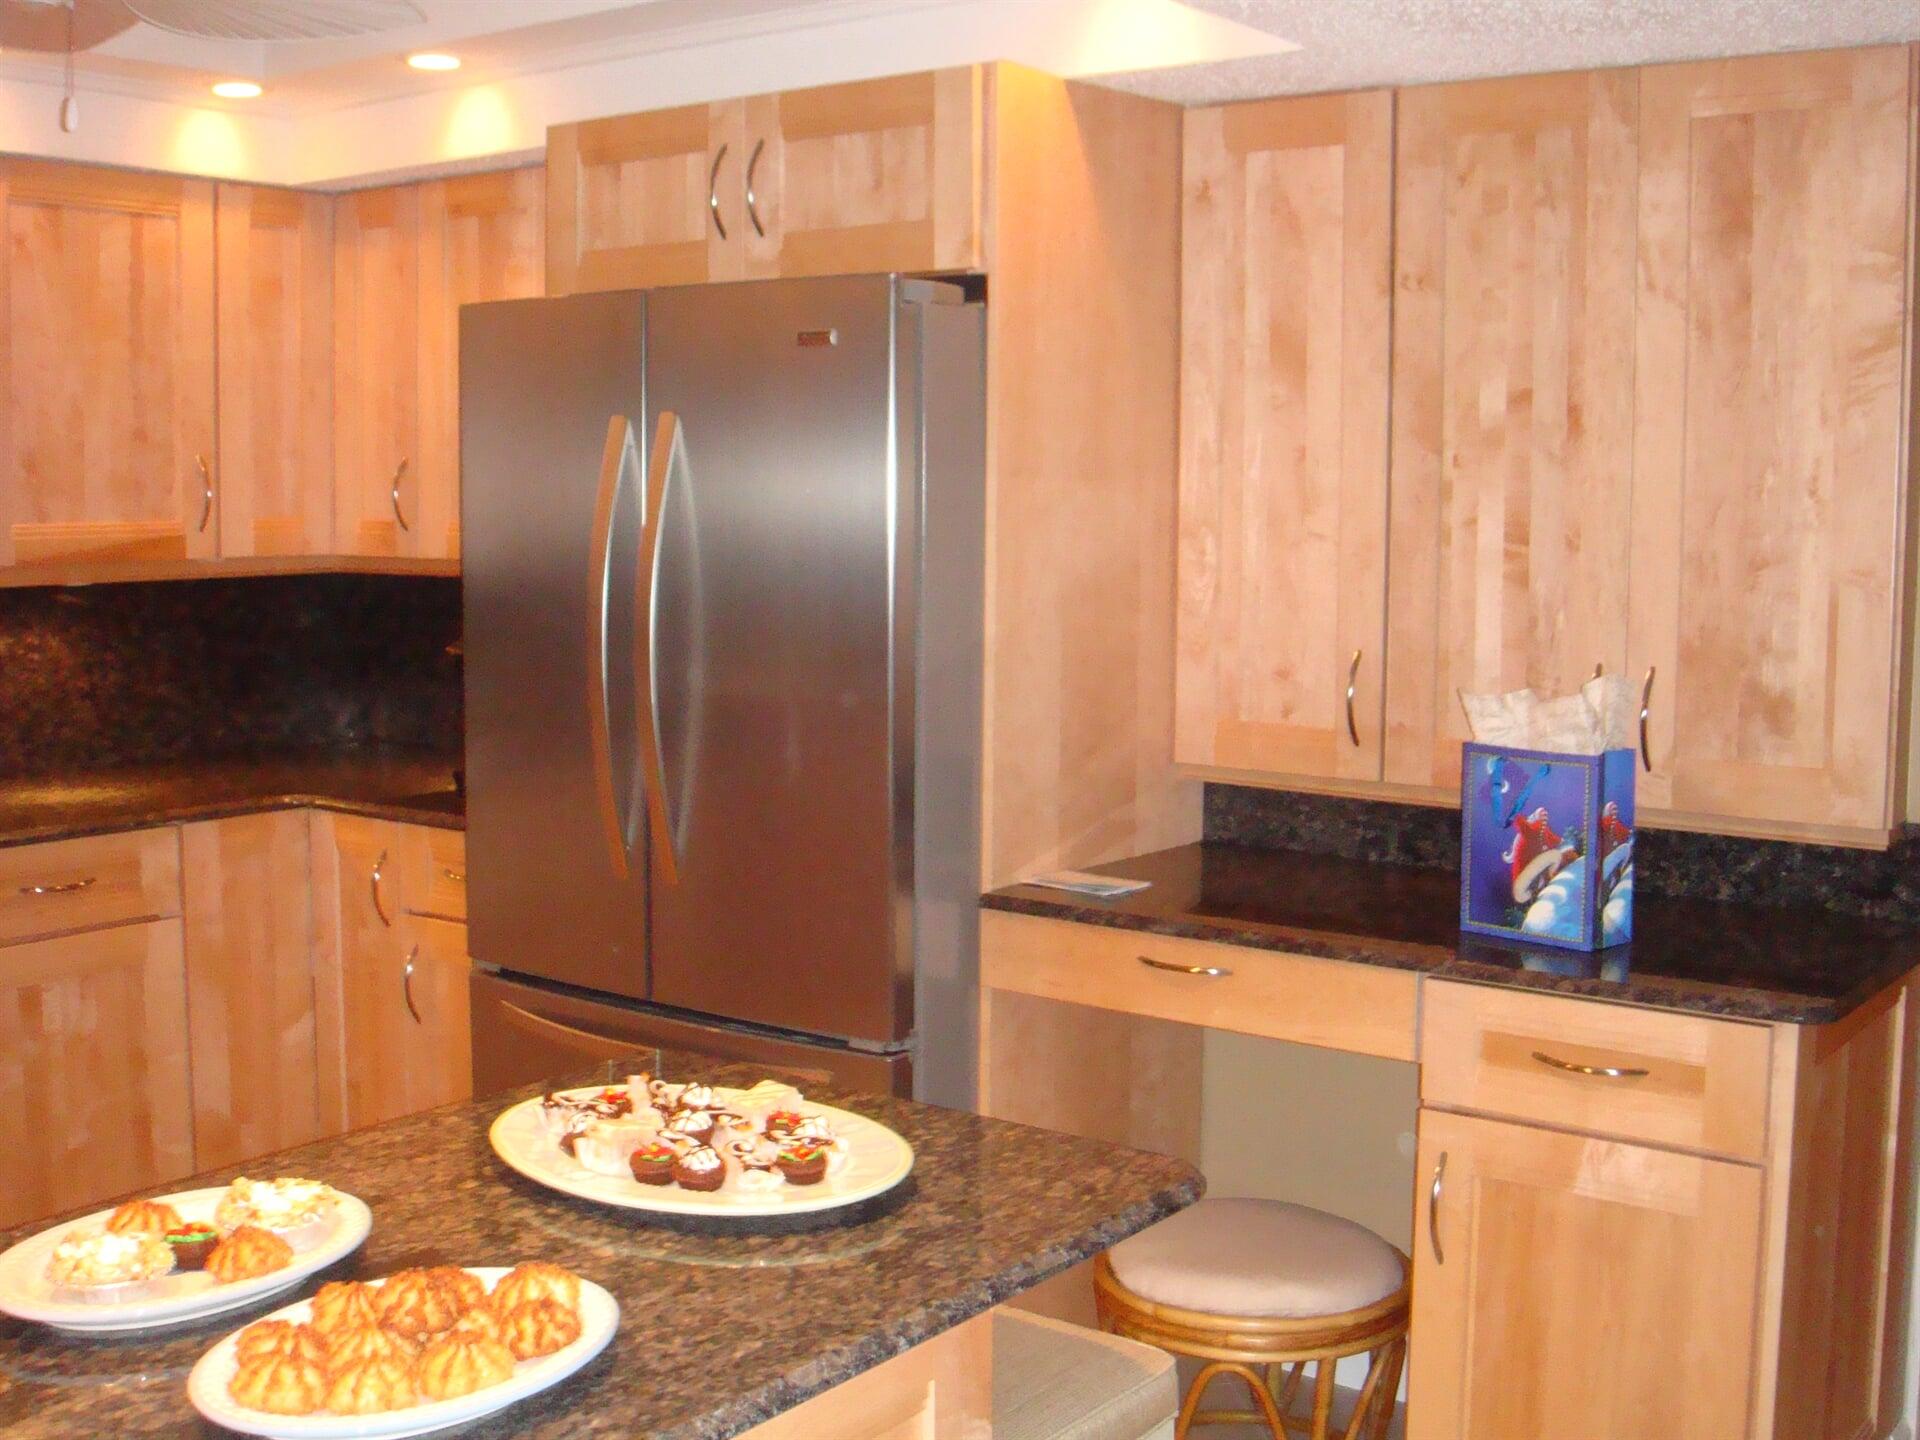 The Stuart, FL area's best countertop store is Agler Kitchen, Bath & Floors